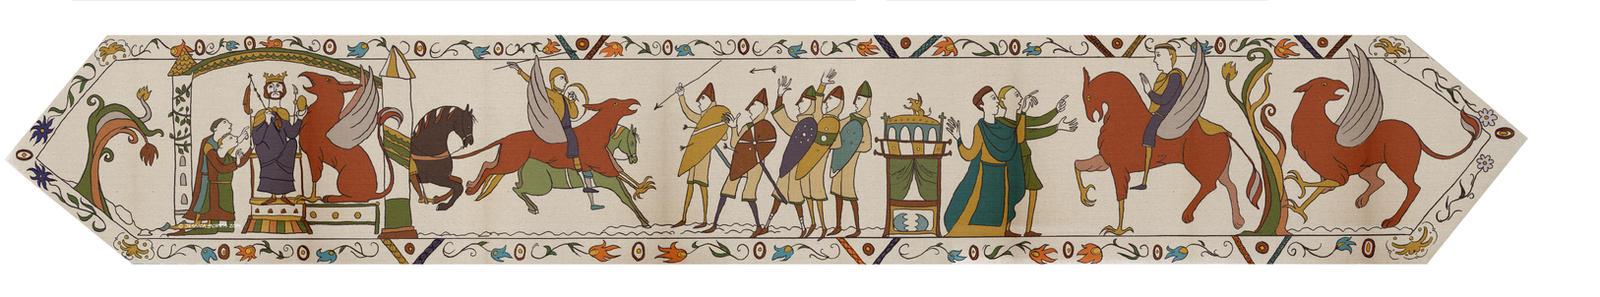 Tapestry Part 1 by pixarjunkie